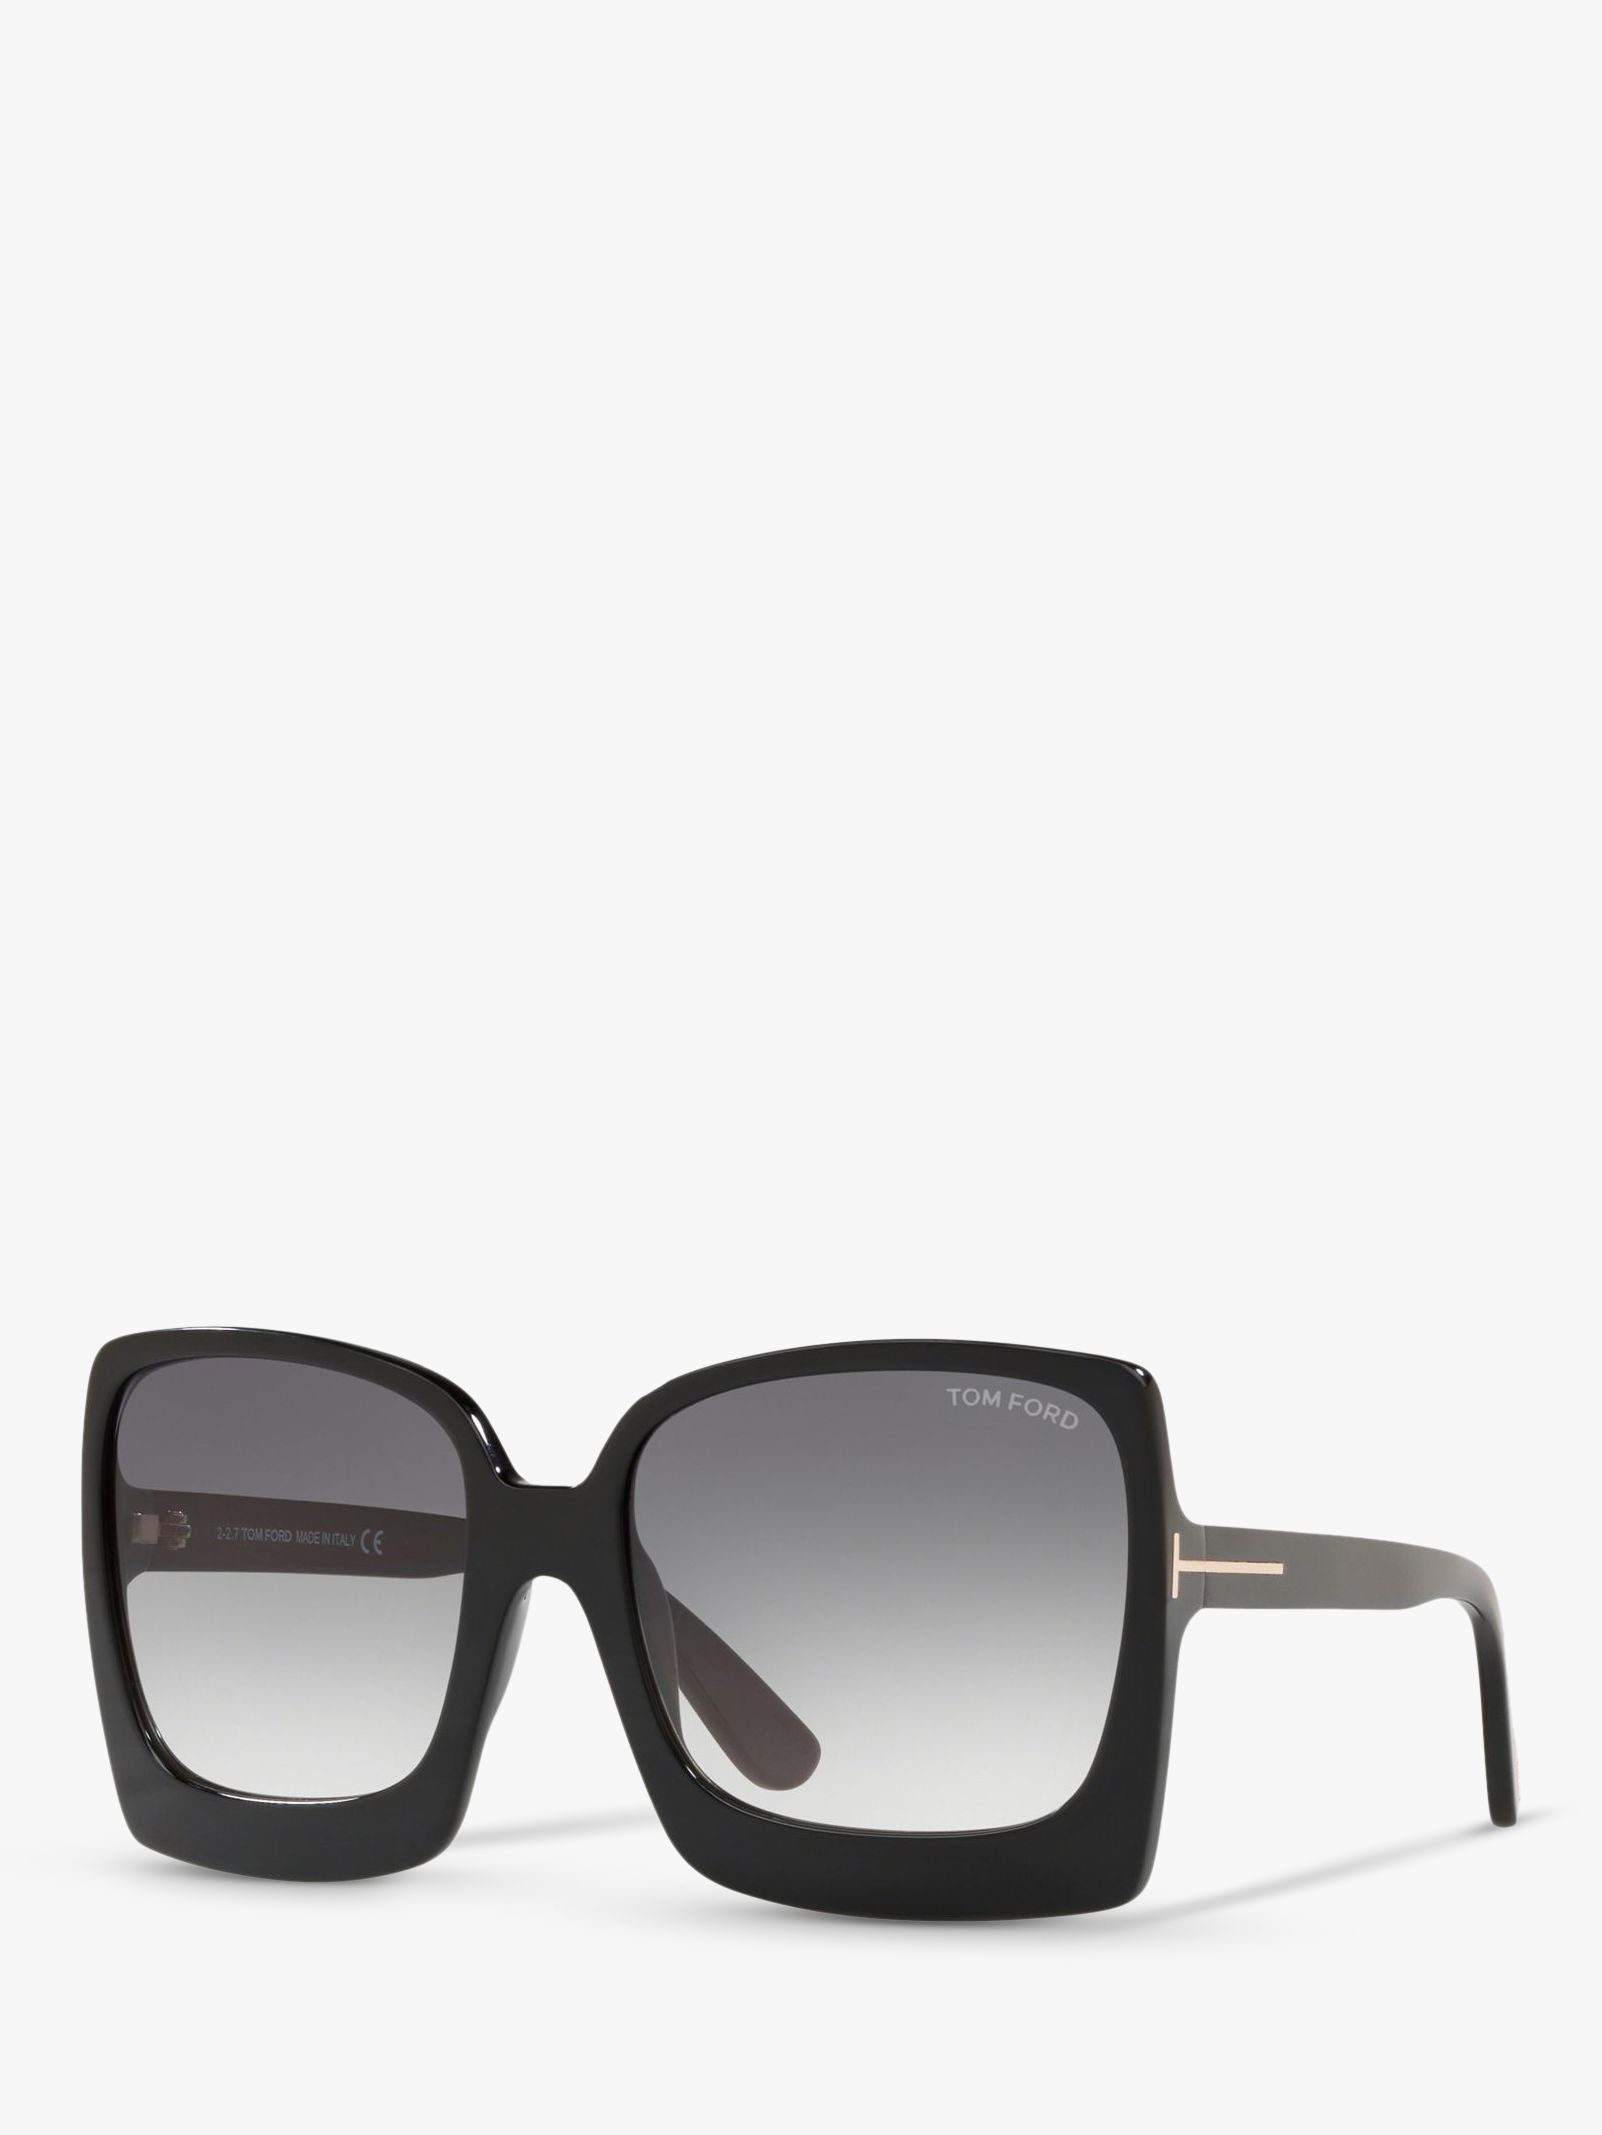 Tom Ford Ft0617 Women S Katrine 02 Oversized Square Sunglasses Black Grey Gradient At John Lewis Partners